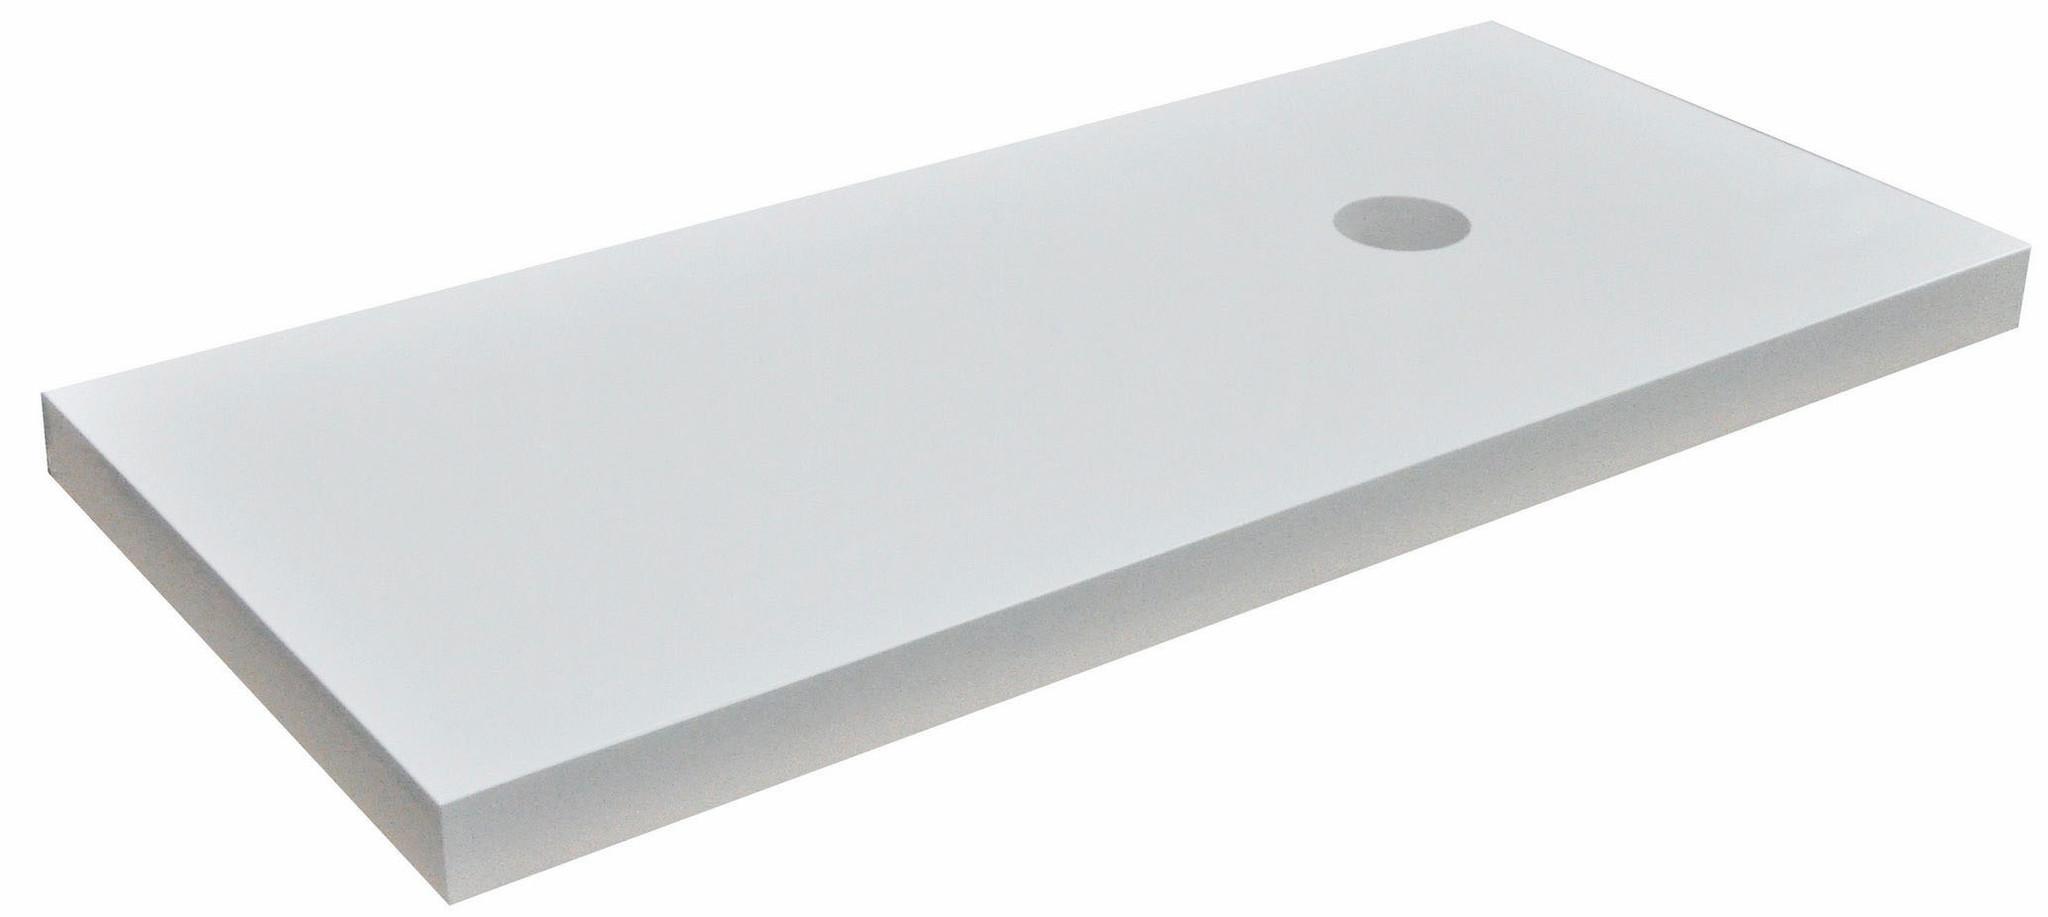 Wiesbaden wastafelblad 100 x 46 x 5,5 cm hoogglans wit gelakt